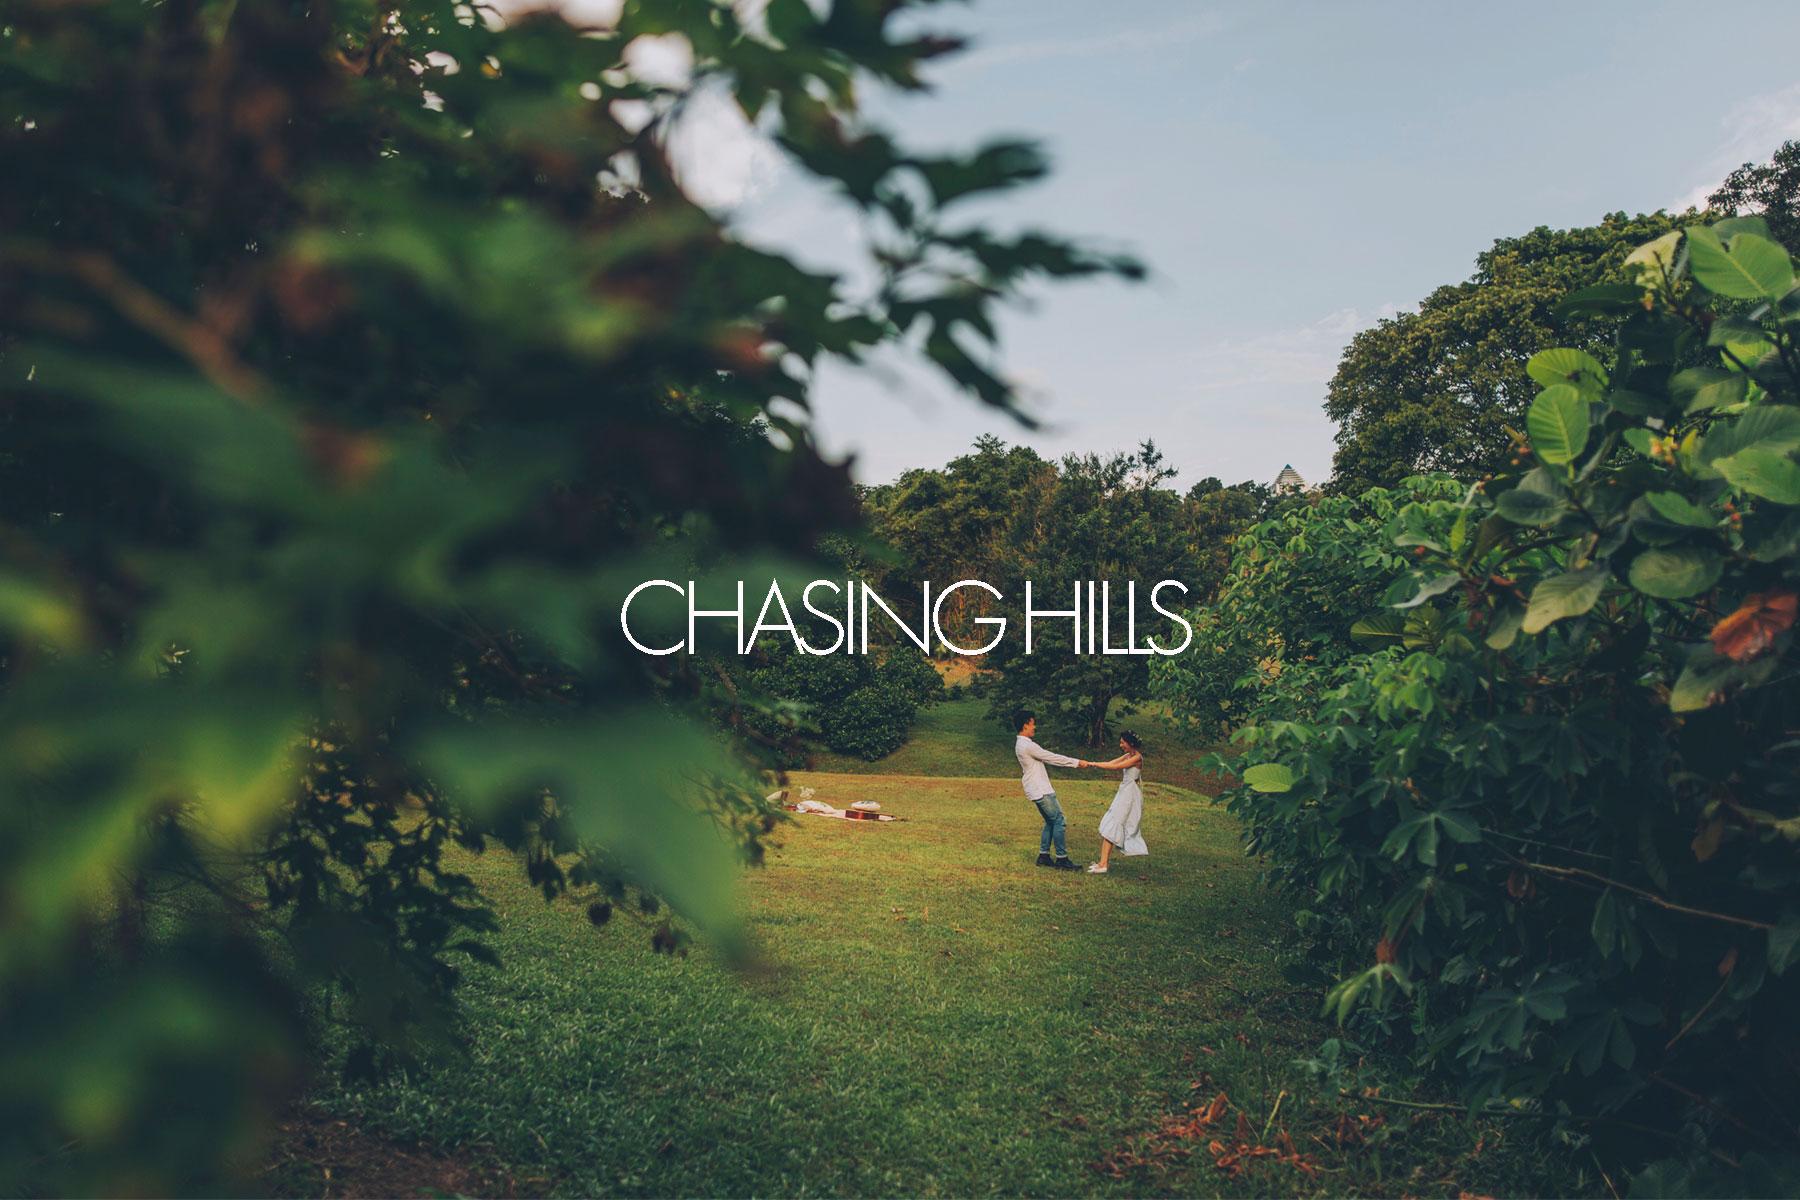 wildest dreams chasing hills